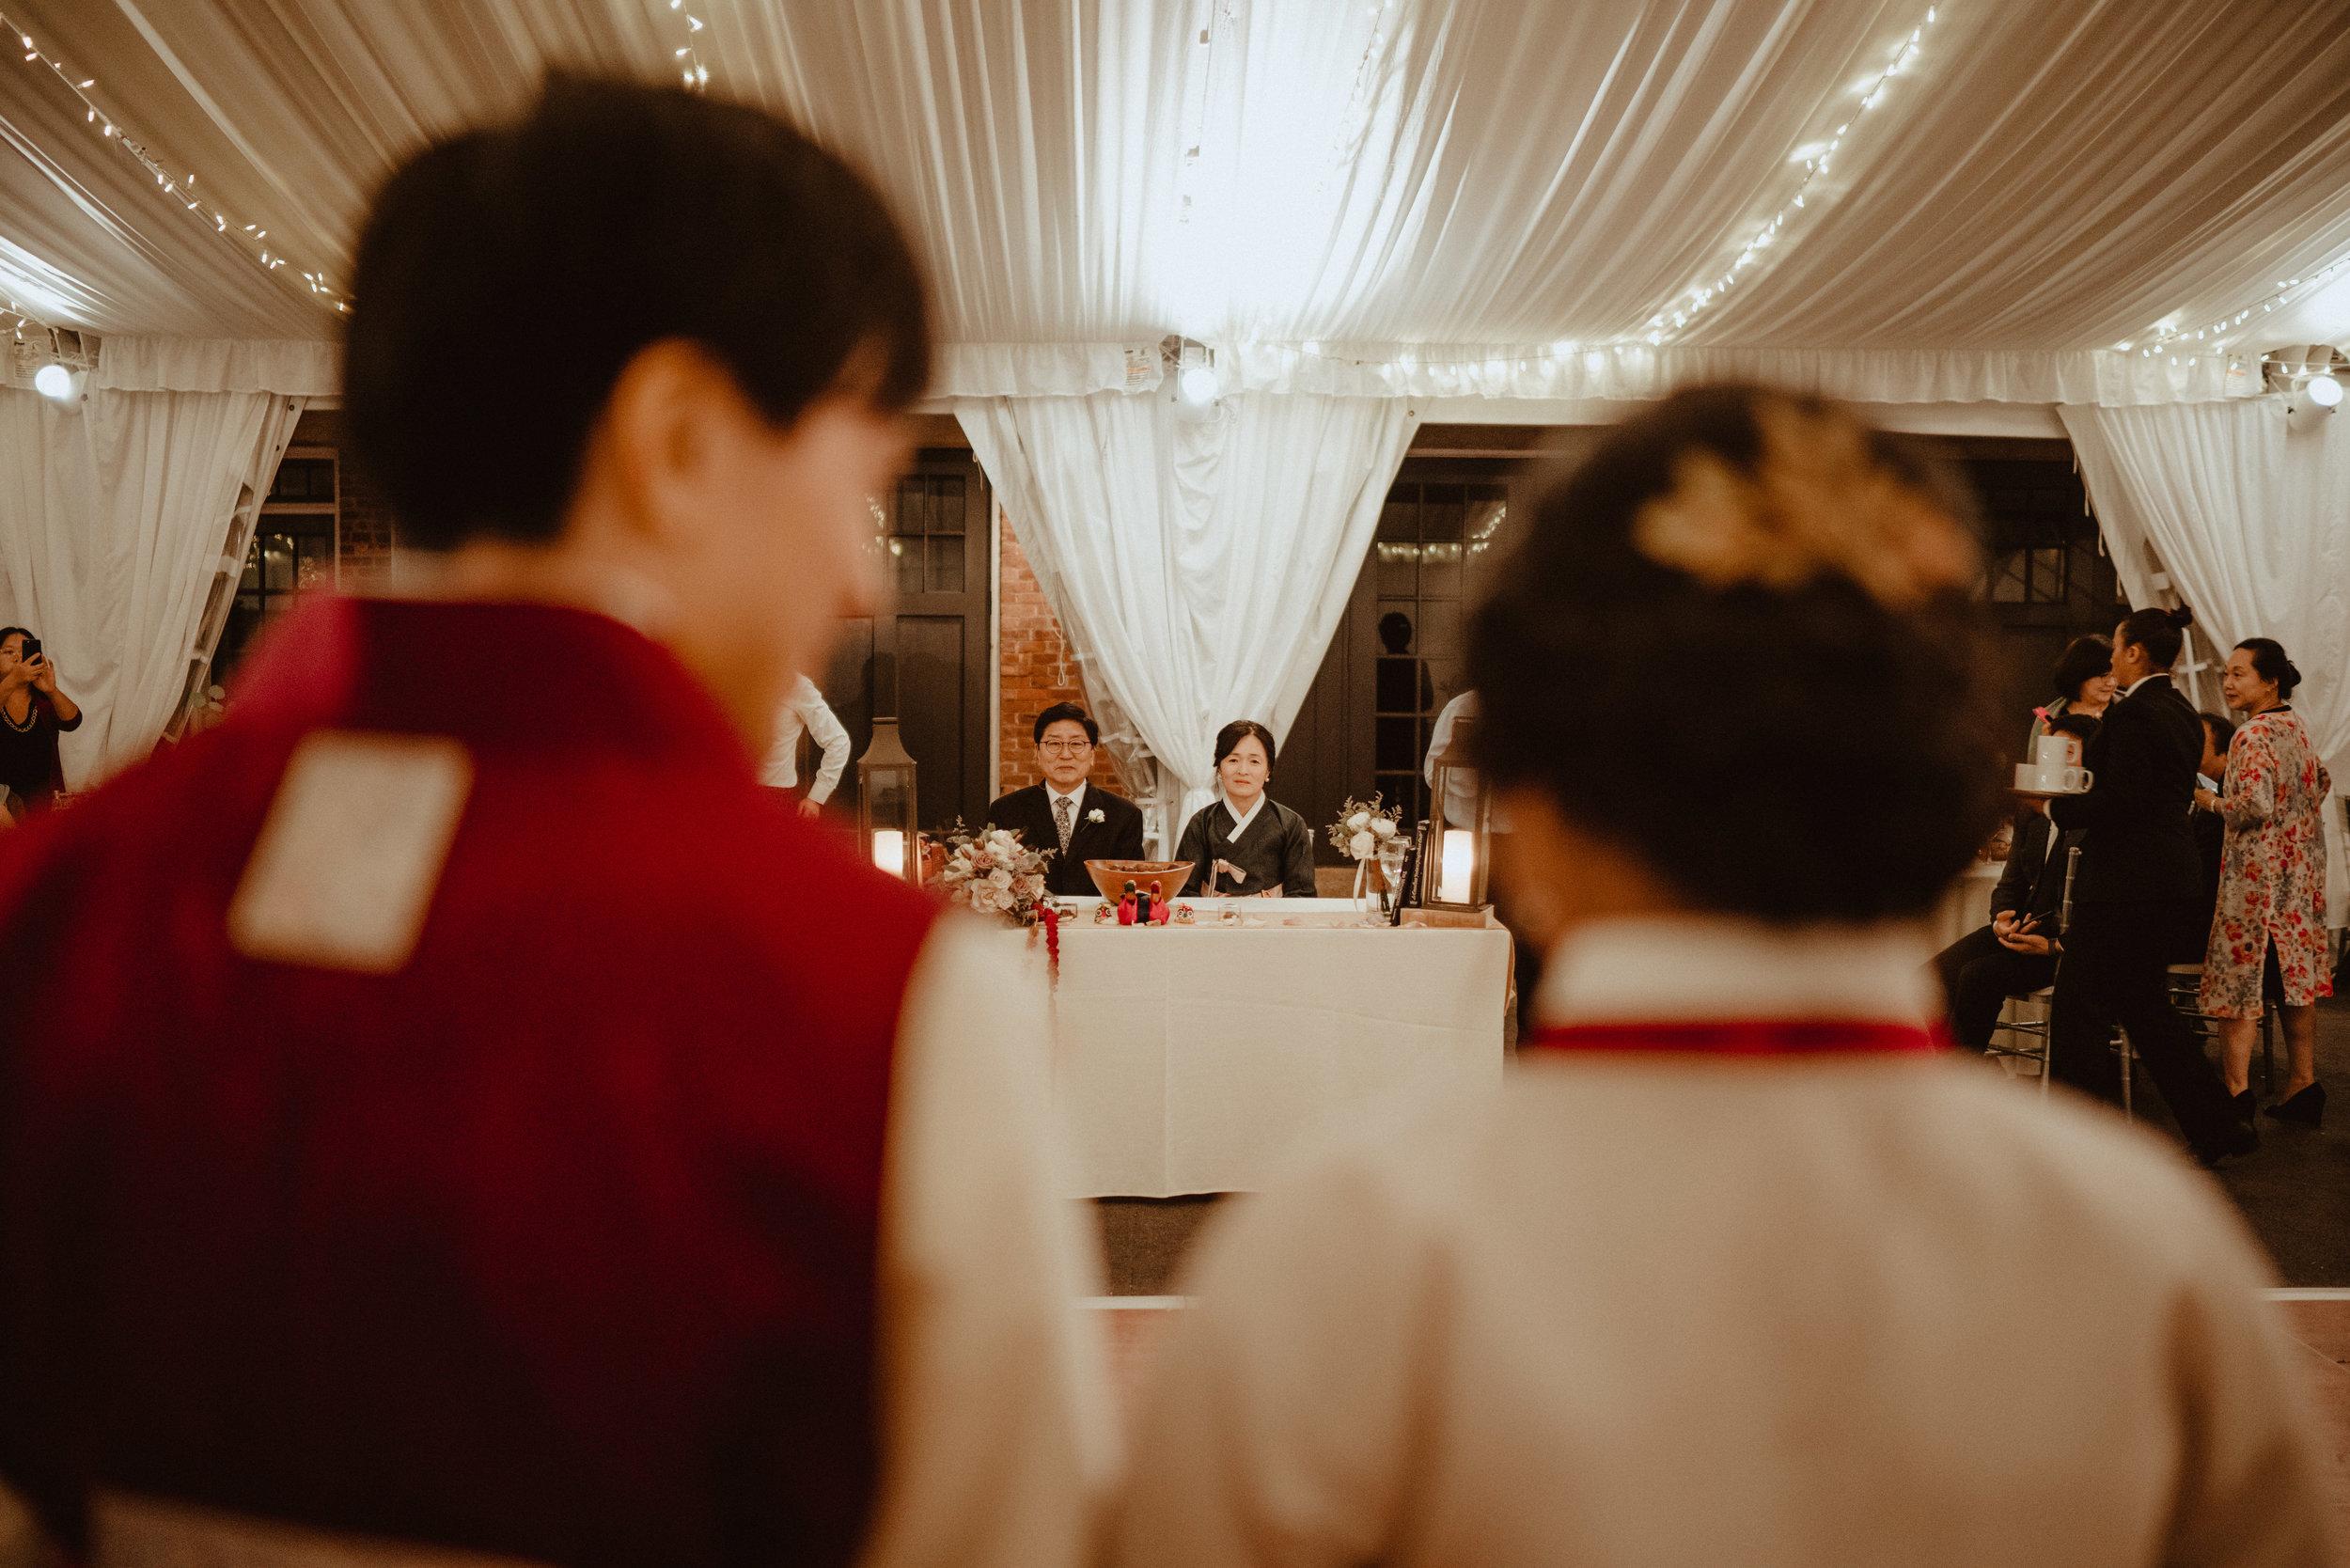 Irene-and-Jae-2019_Brooklyn_Wedding_Photographer_Chellise_Michael_Photography--139.jpg